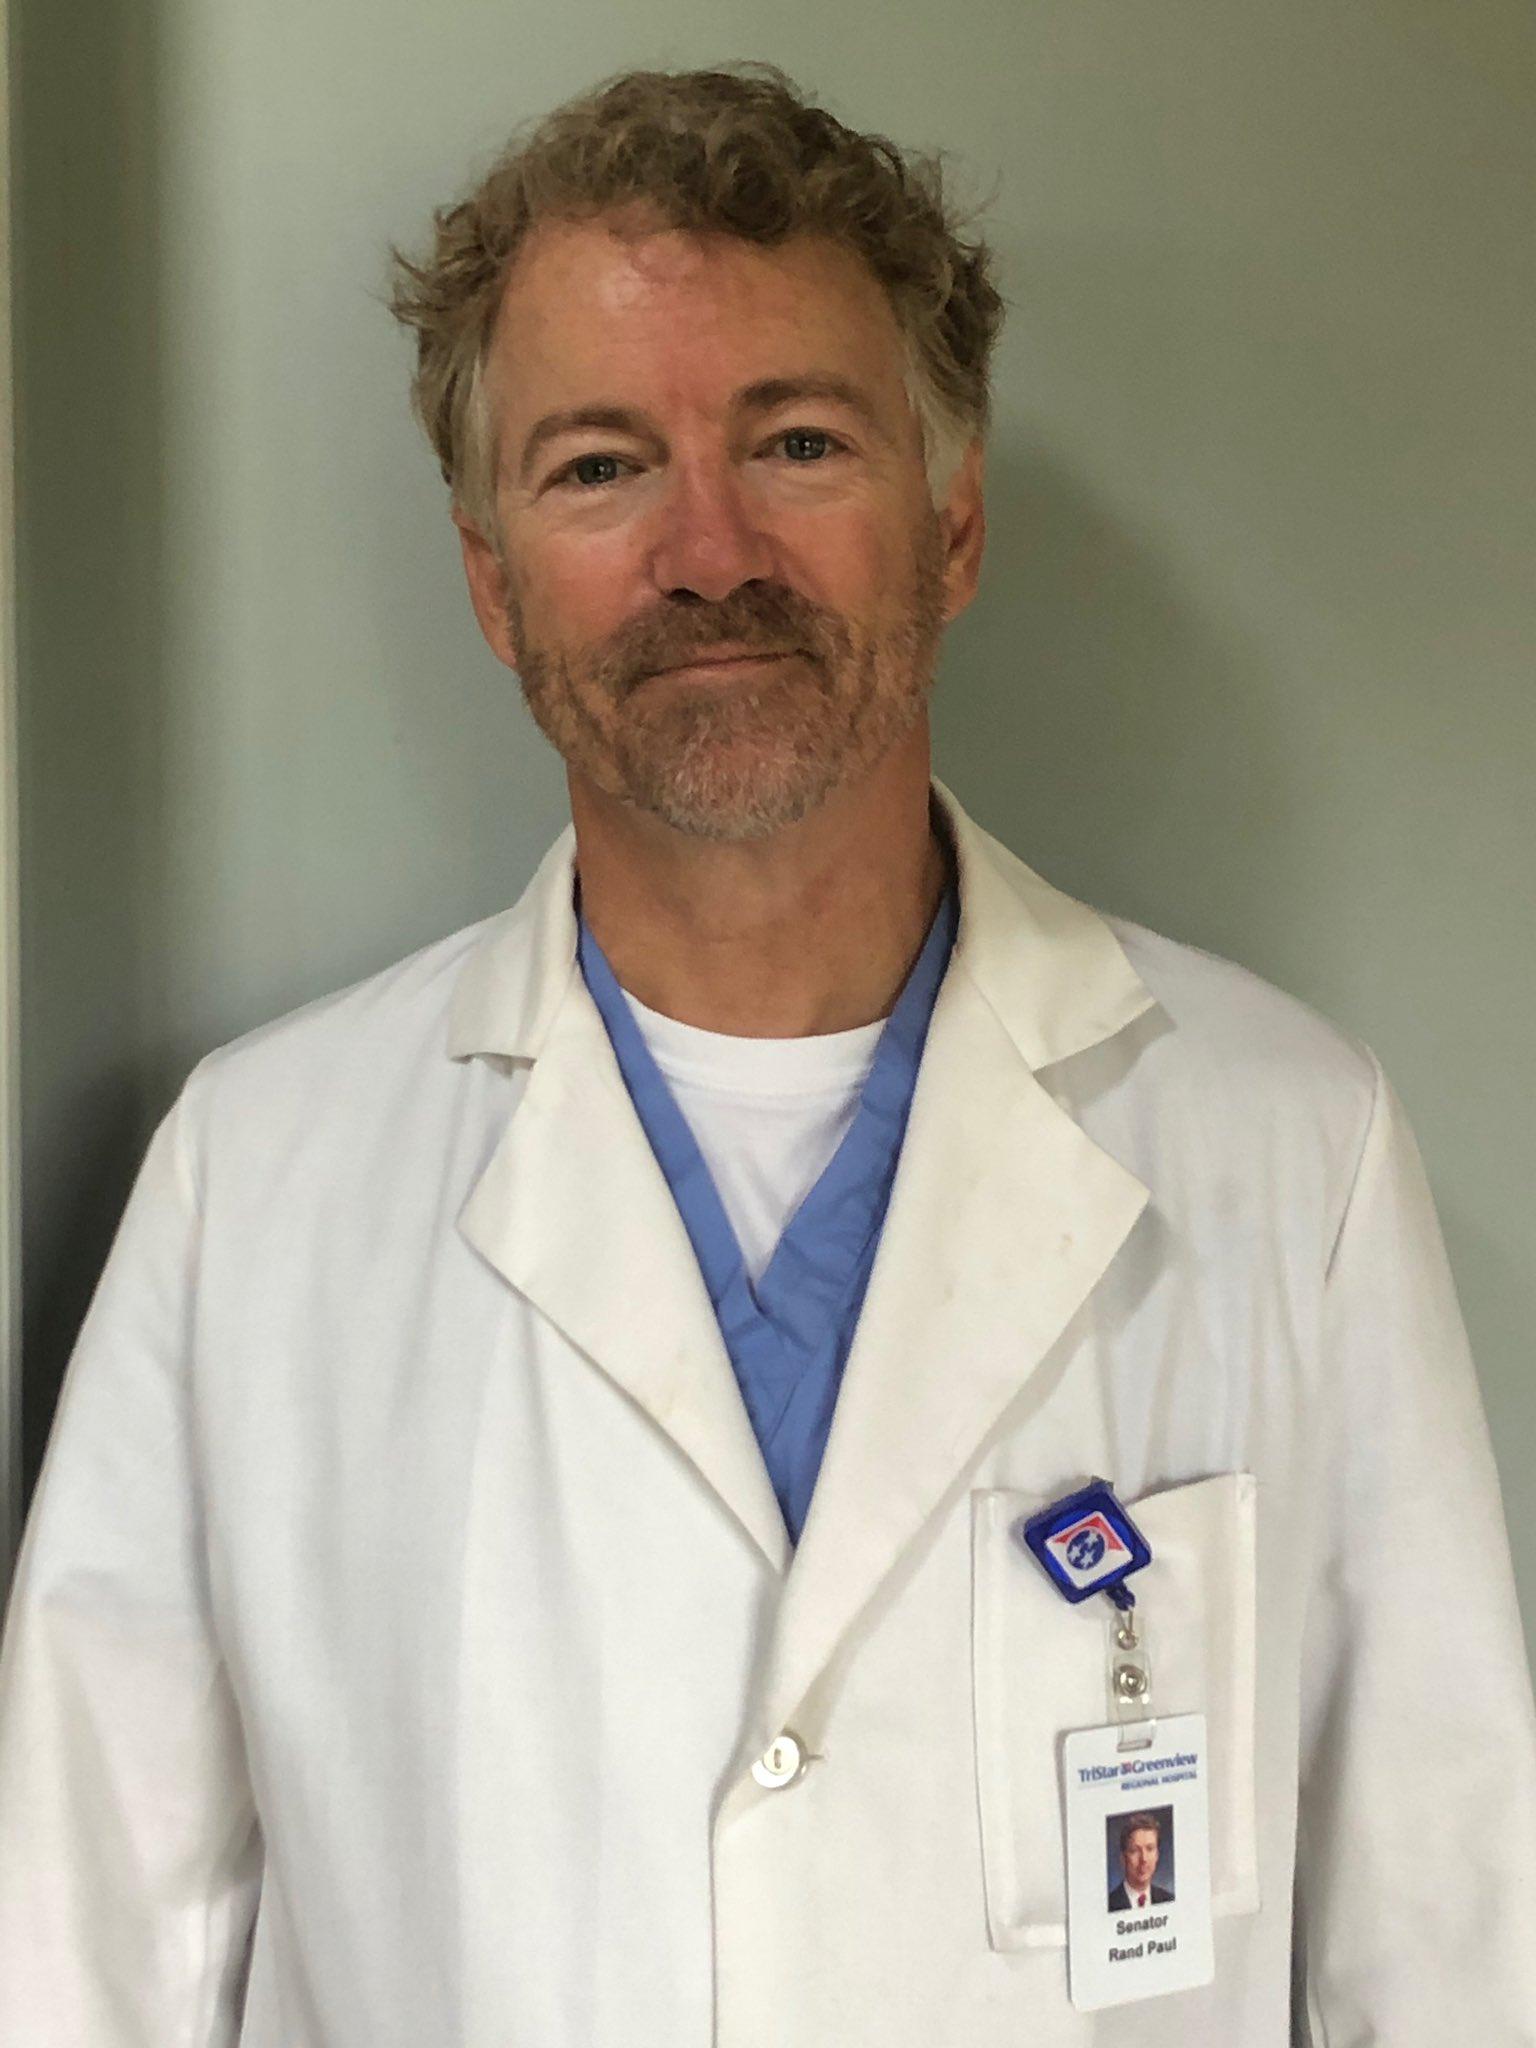 GOOD NEWS: Senator Rand Paul Beats Coronavirus Now Back Volunteering to Treat Patients